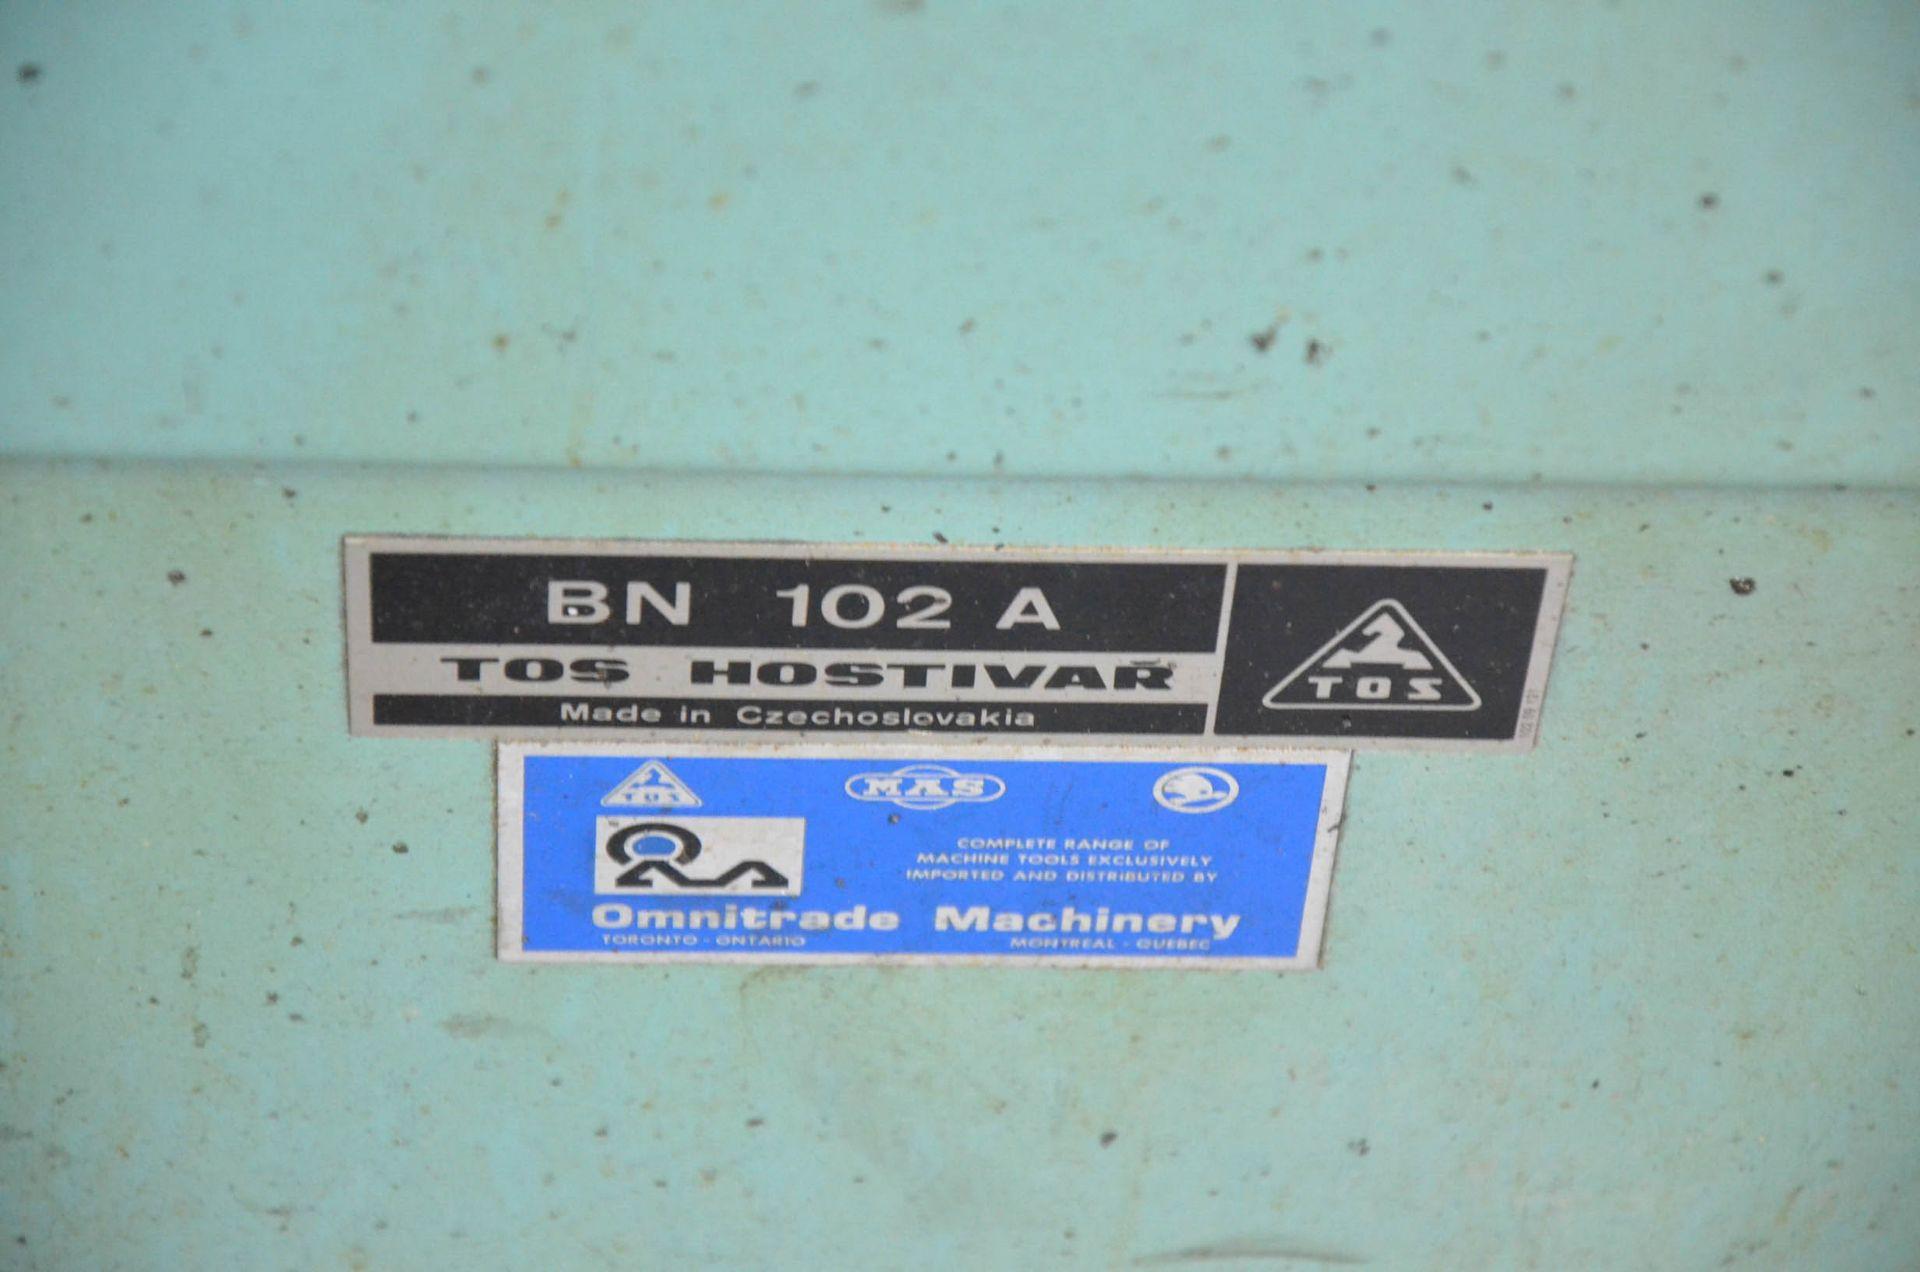 TOS HOSTIVAR BN102A FLOOR-TYPE TOOL AND CUTTER GRINDER, 575V/3PH/60HZ, S/N: 789 (CI) [RIGGING FEES - Image 2 of 3